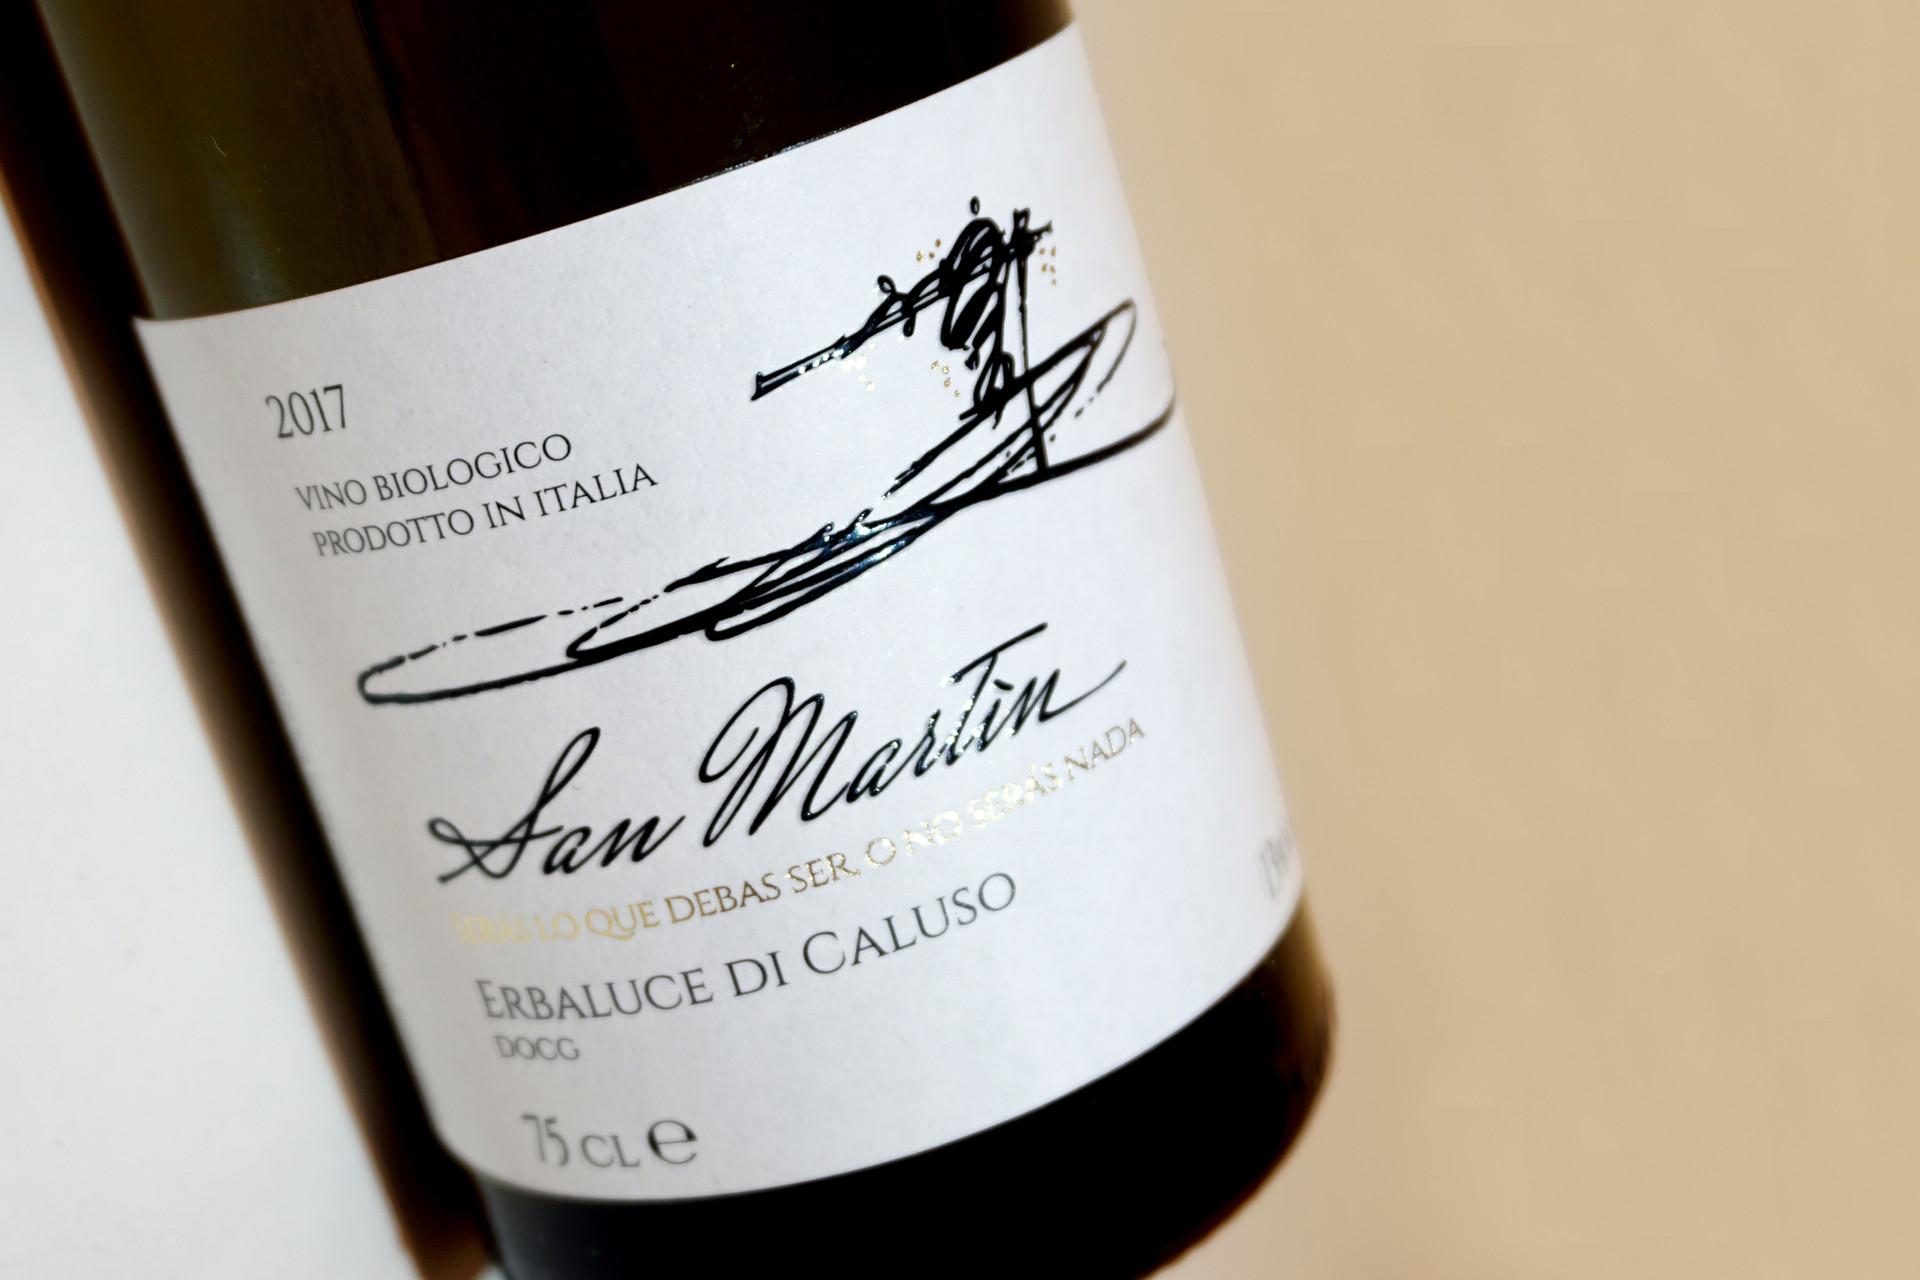 san martin-moncrivello-mancusi-www.artel